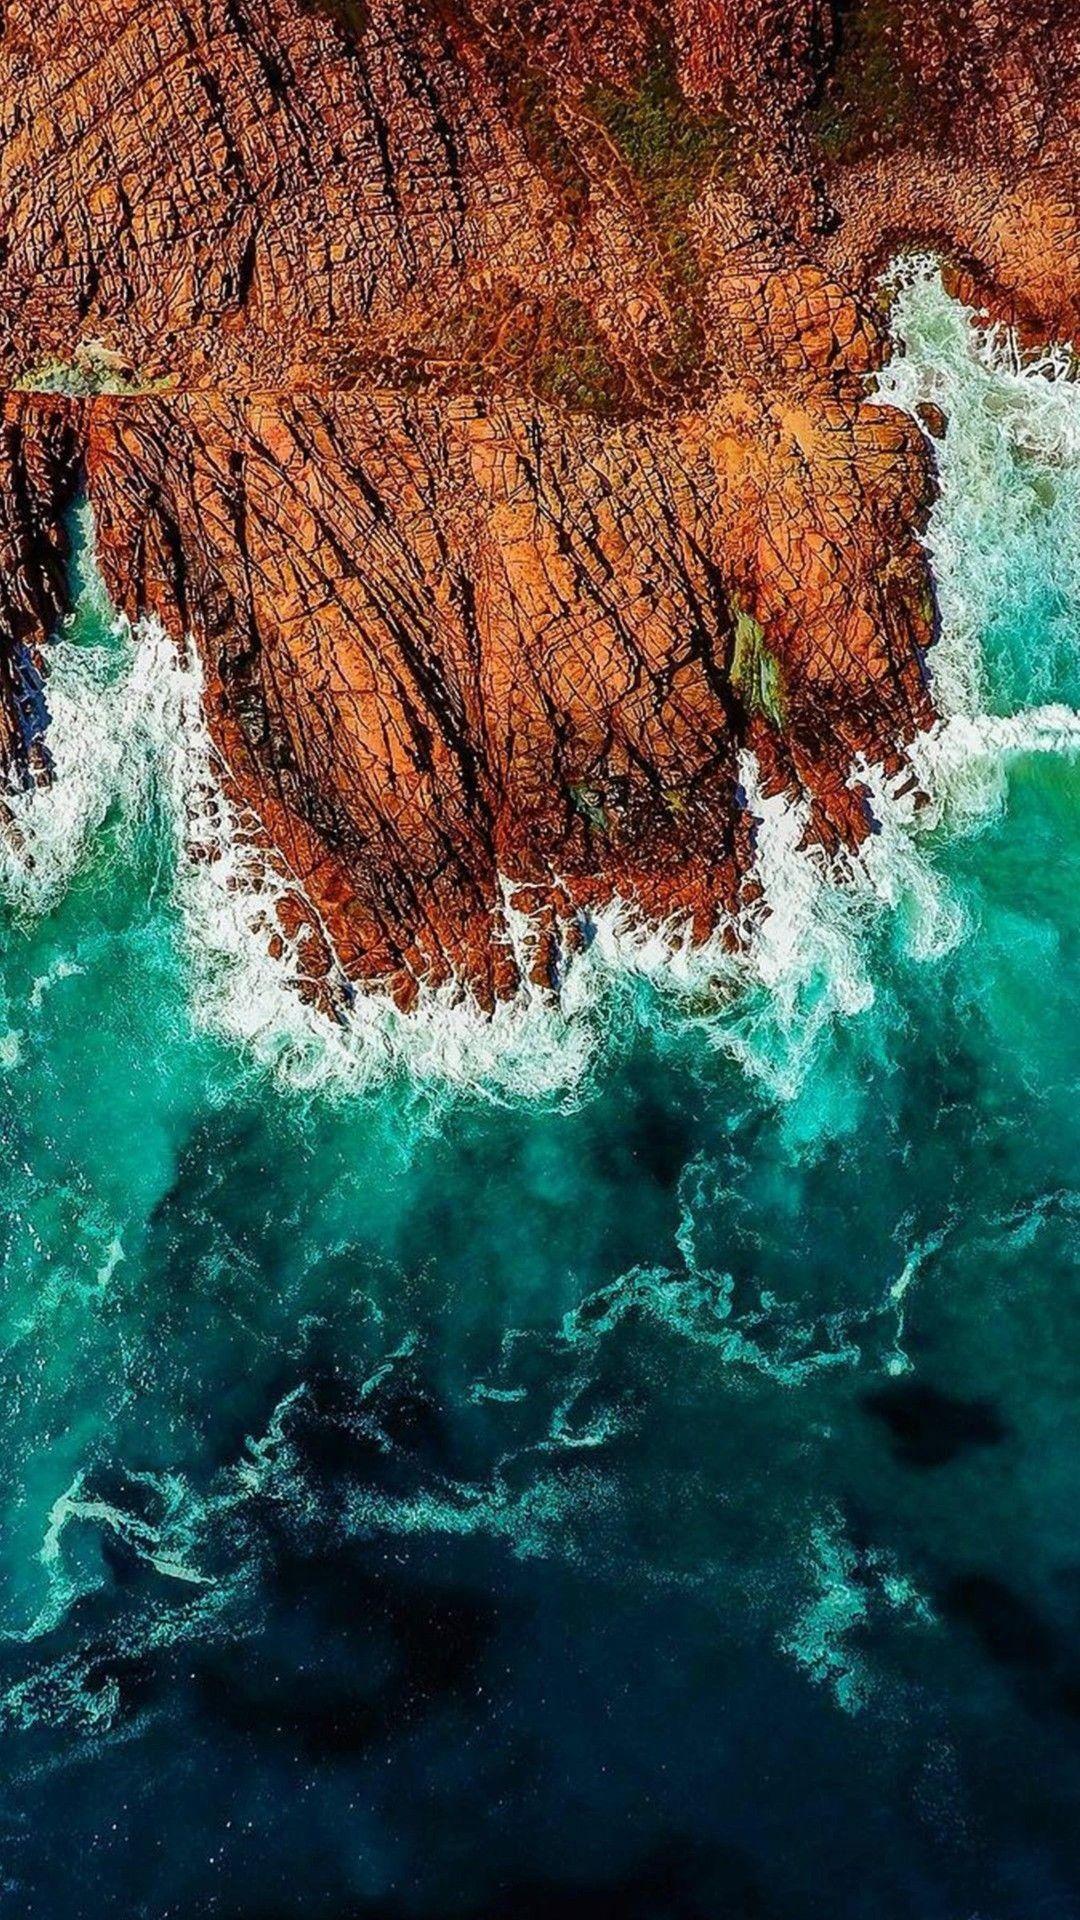 Pin By Rahul Kumar On 4k Wallpepar Ocean Wallpaper Ios 11